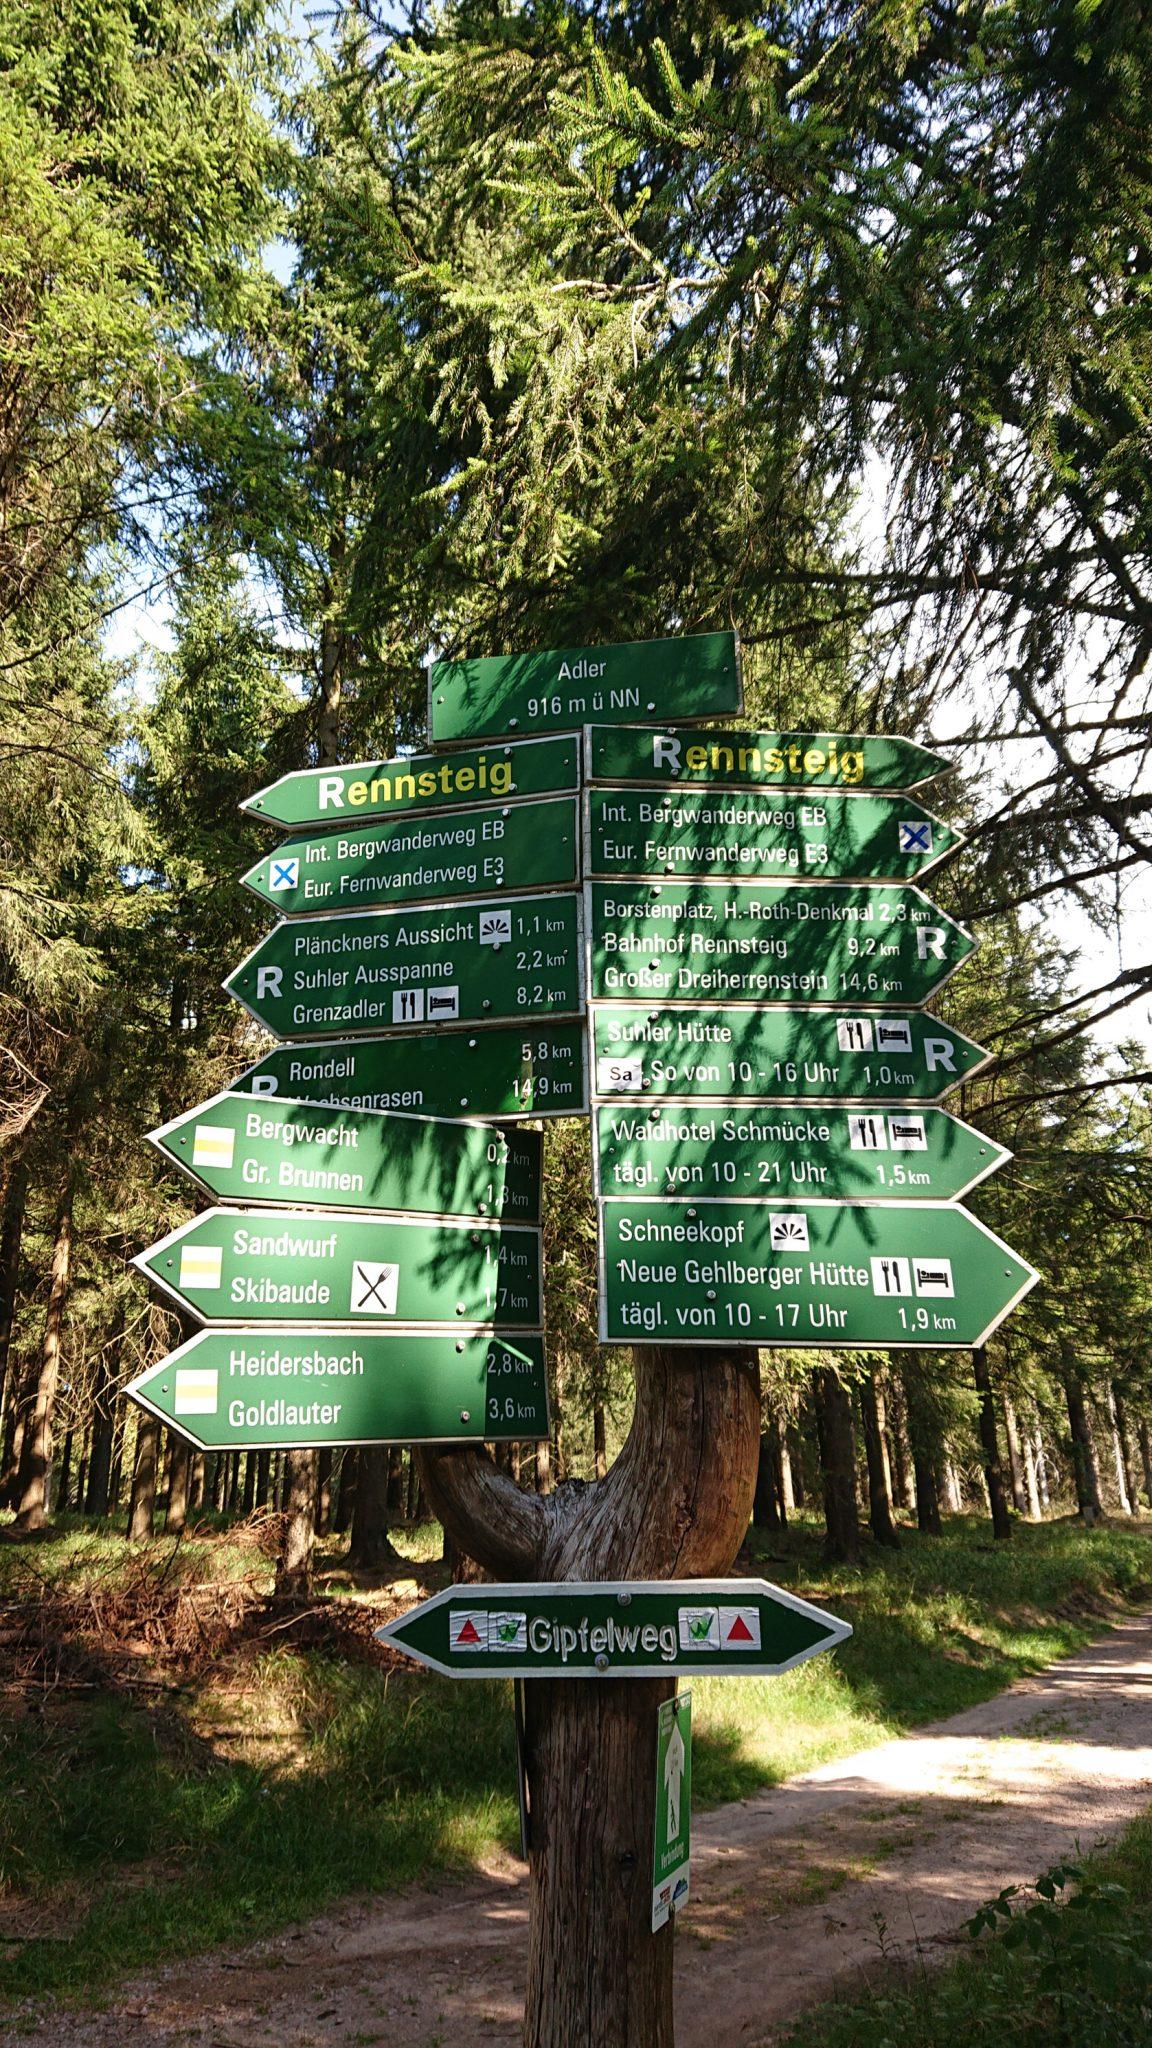 Großer Beerberg Schneekopf und Teufelskanzel, Gipfeltour Wanderung im Thüringer Wald, Wegmarkierung Gipfelweg Adler